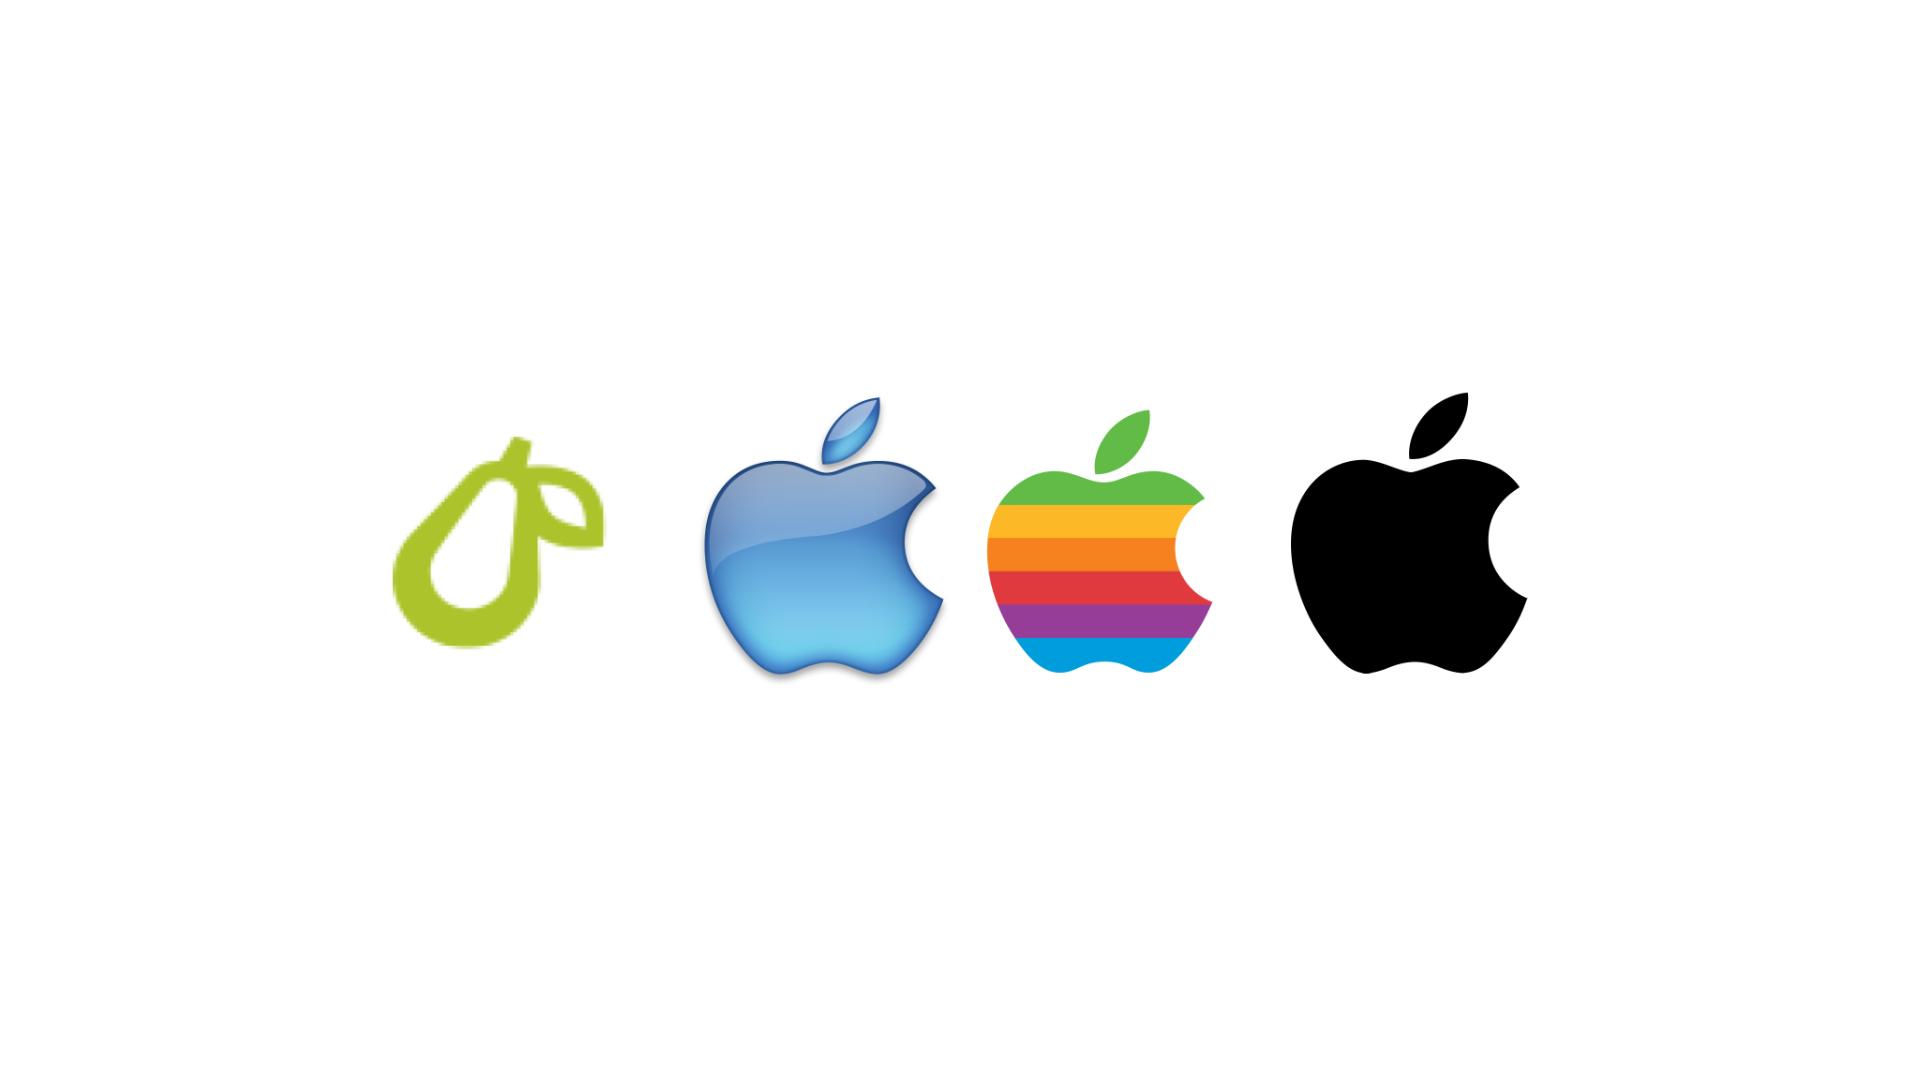 https://www.numerama.com/content/uploads/2020/08/apple-prepear.jpg